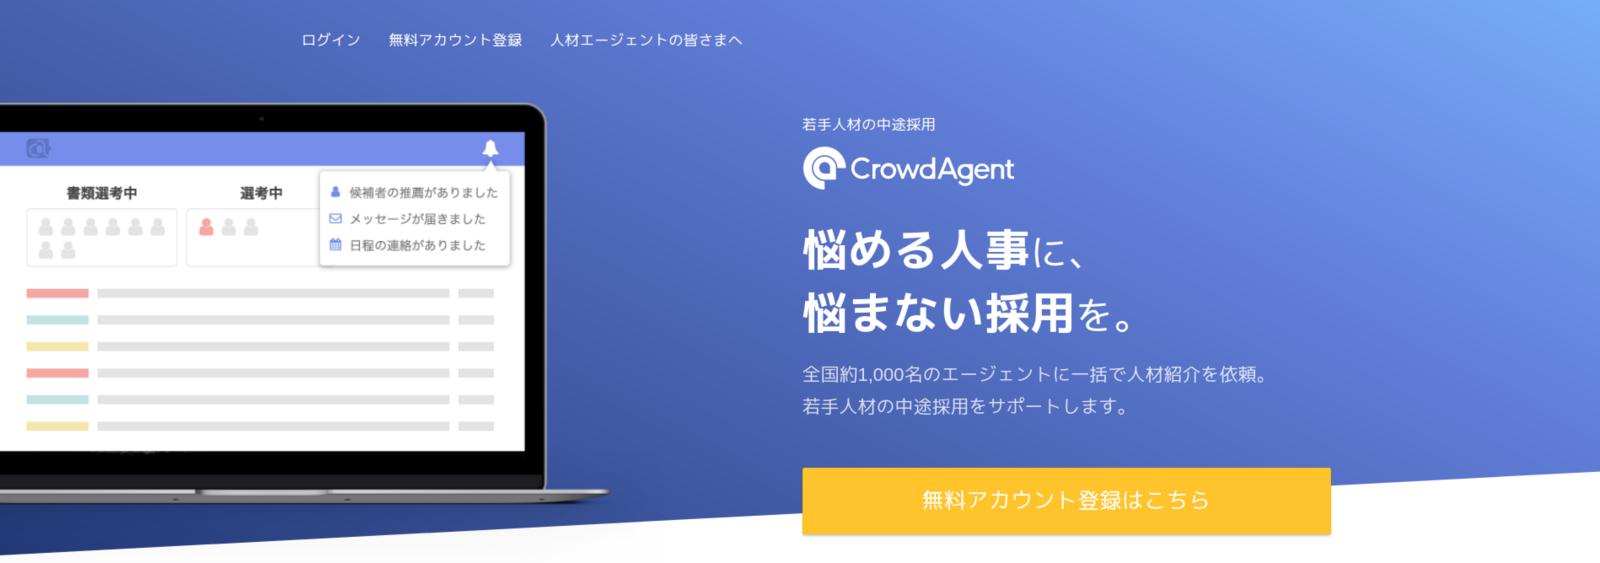 http://www.crowd-agent.com/